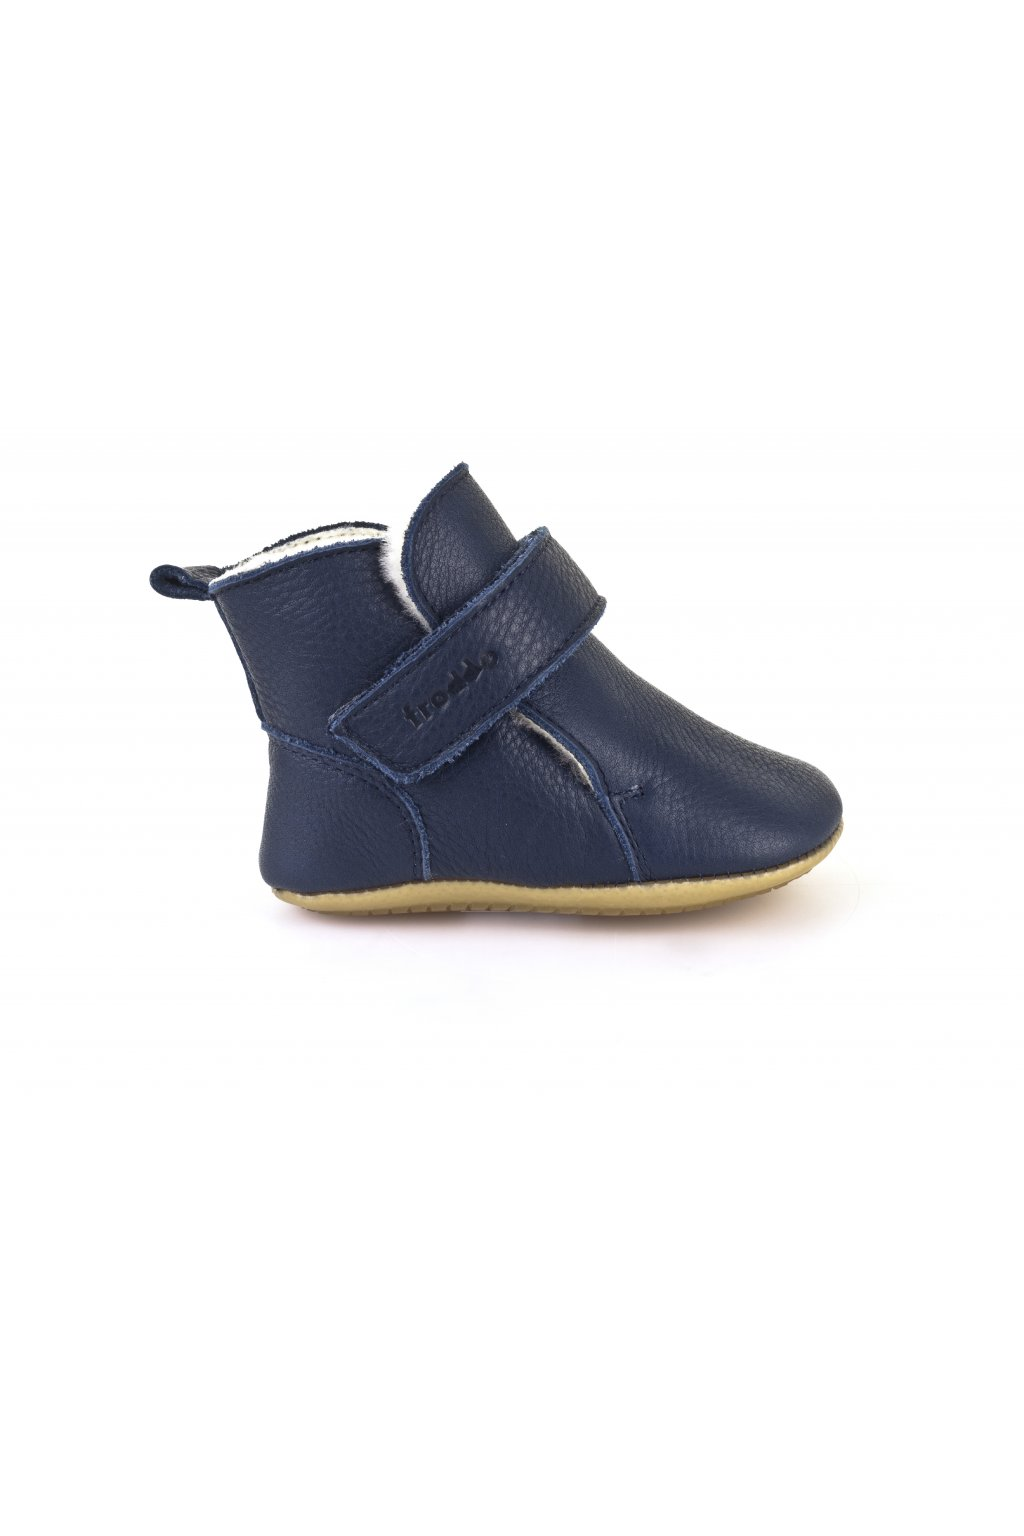 Froddo Prewalkers BOOTS Dark Blue-kolekcia zima 2017/2018/2019